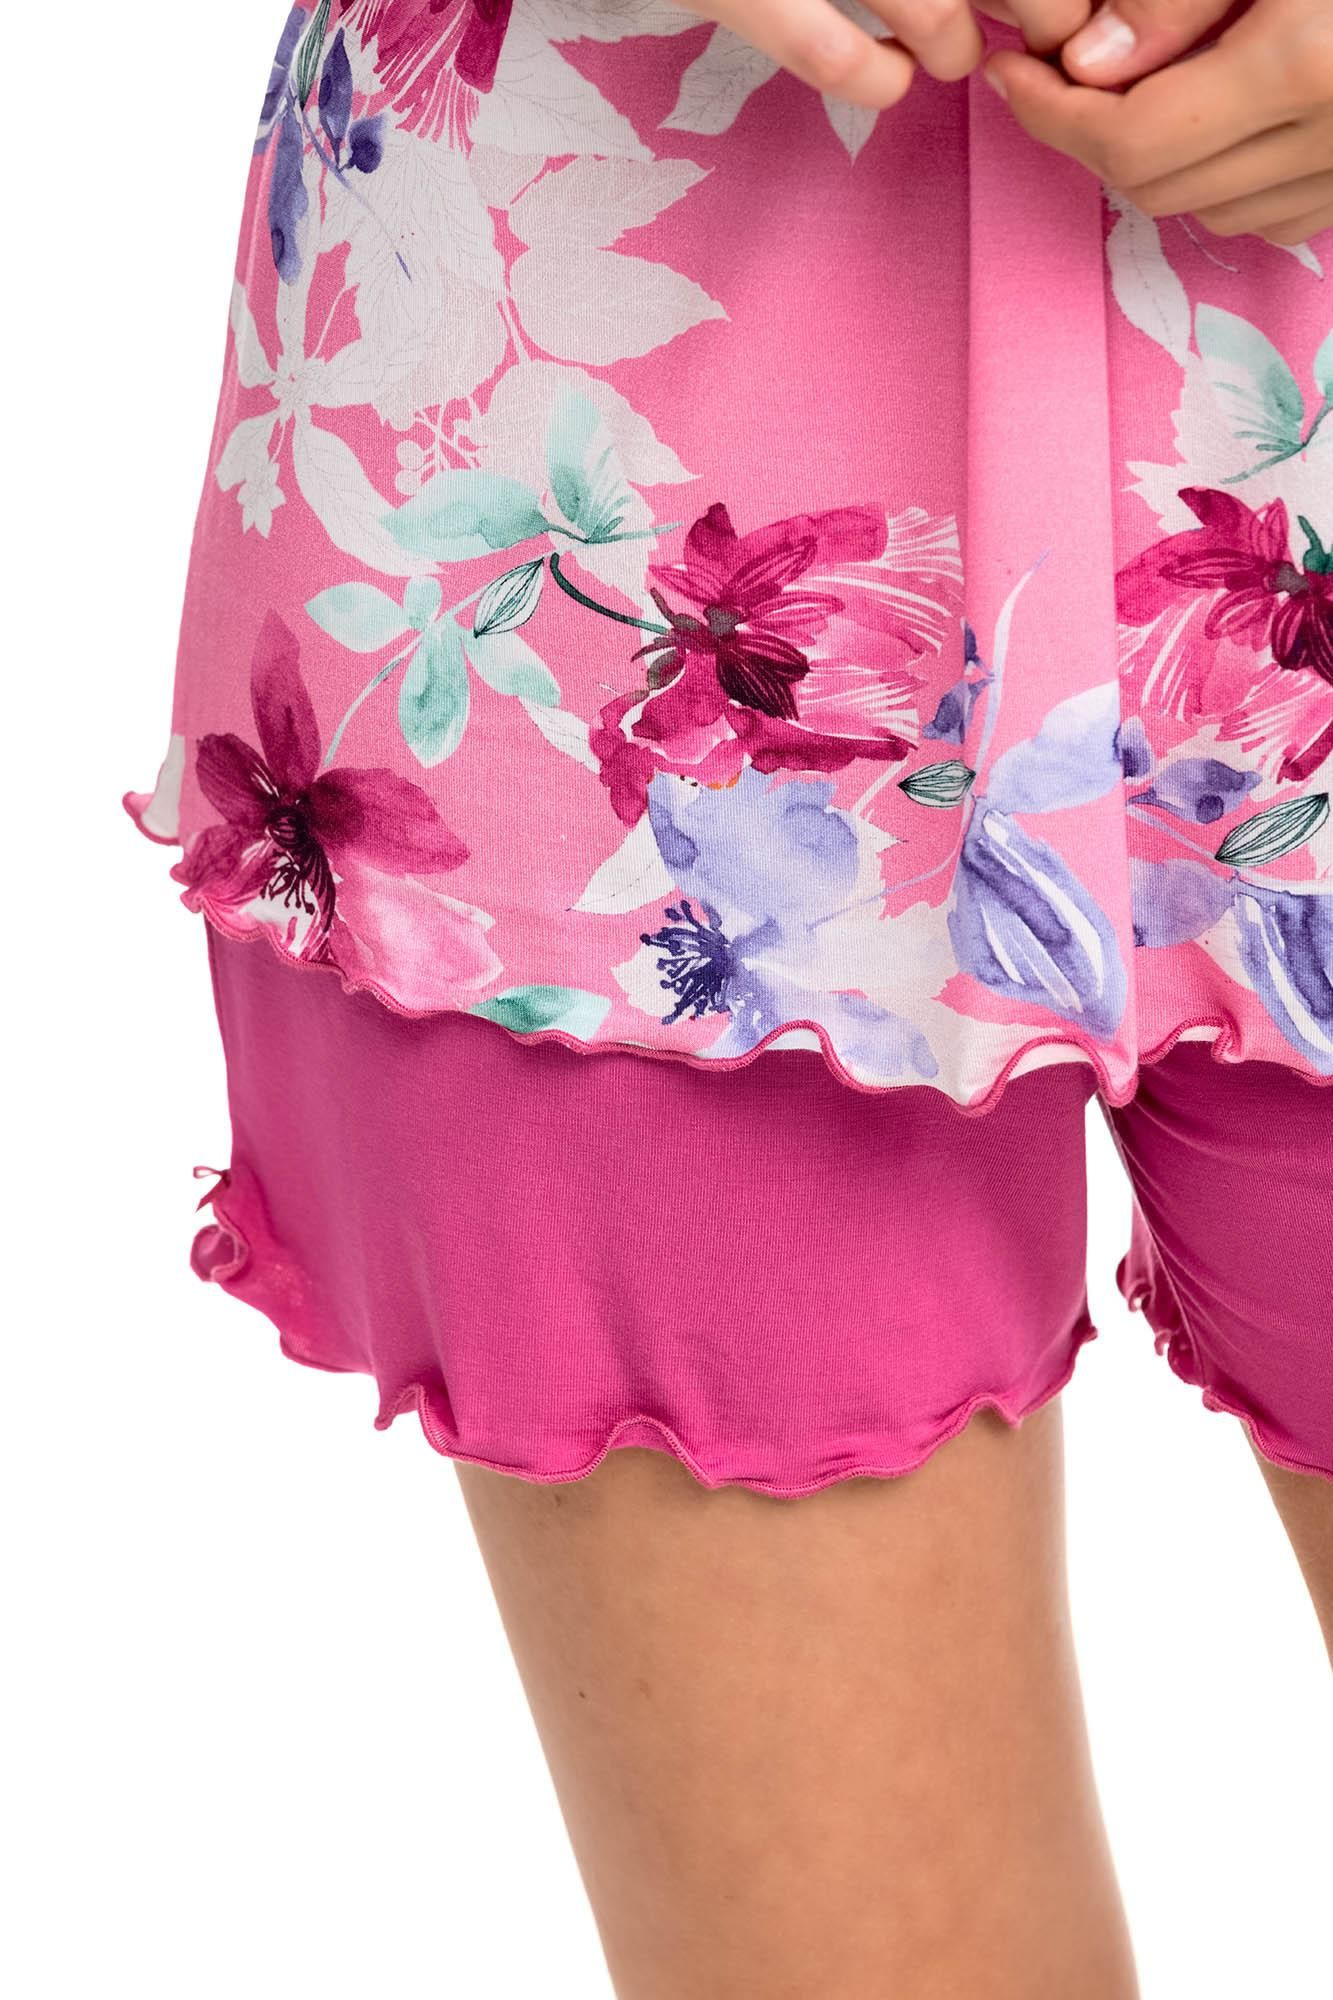 Women's Sleeveless Top and Shorts Pyjamas